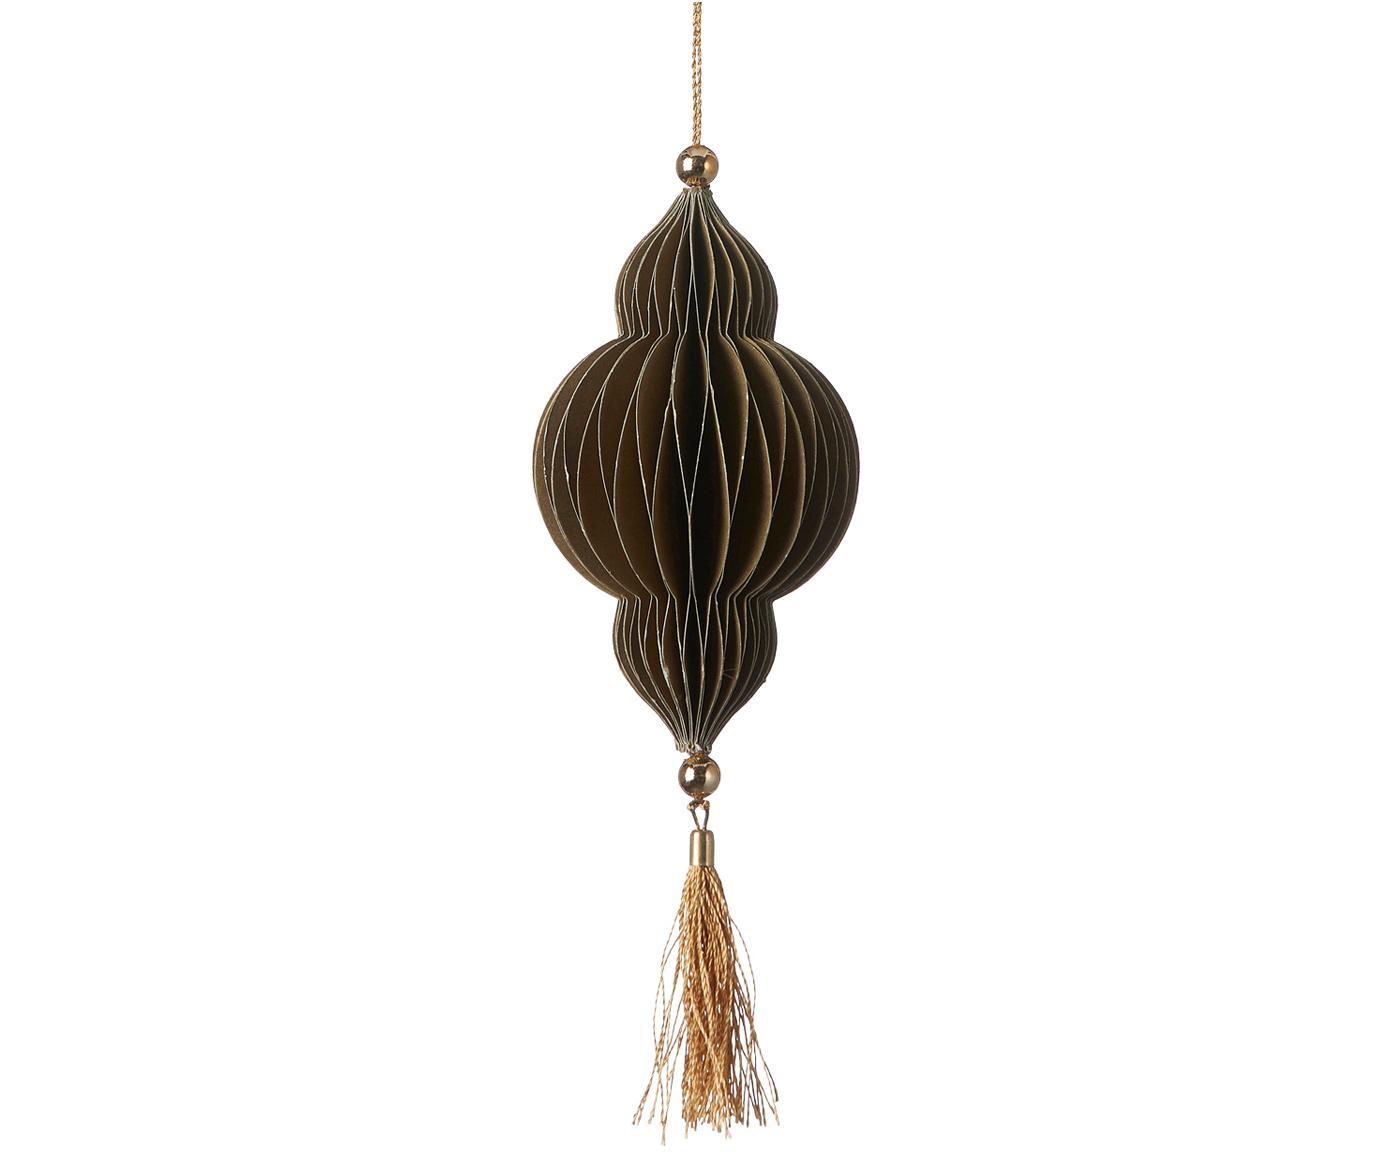 Baumanhänger Icilisse, 2 Stück, Dunkelgrün, Goldfarben, Ø 6 x H 17 cm